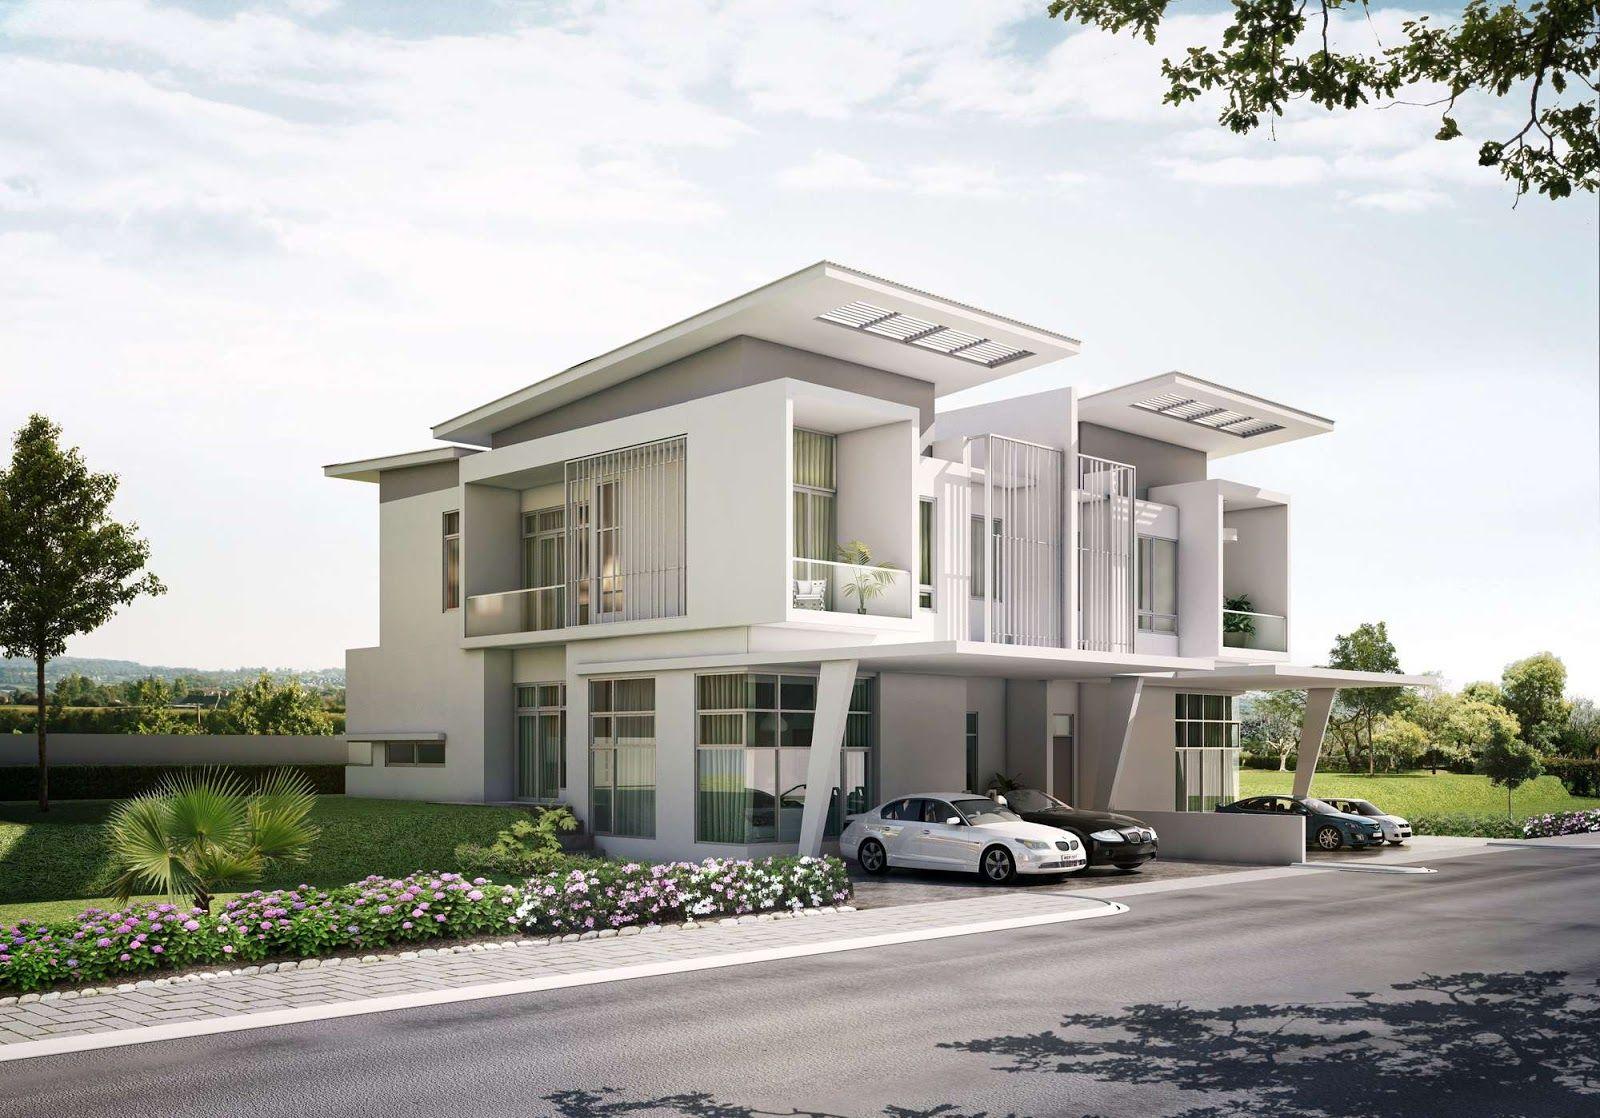 New home designs latest singapore modern homes exterior also rh pinterest